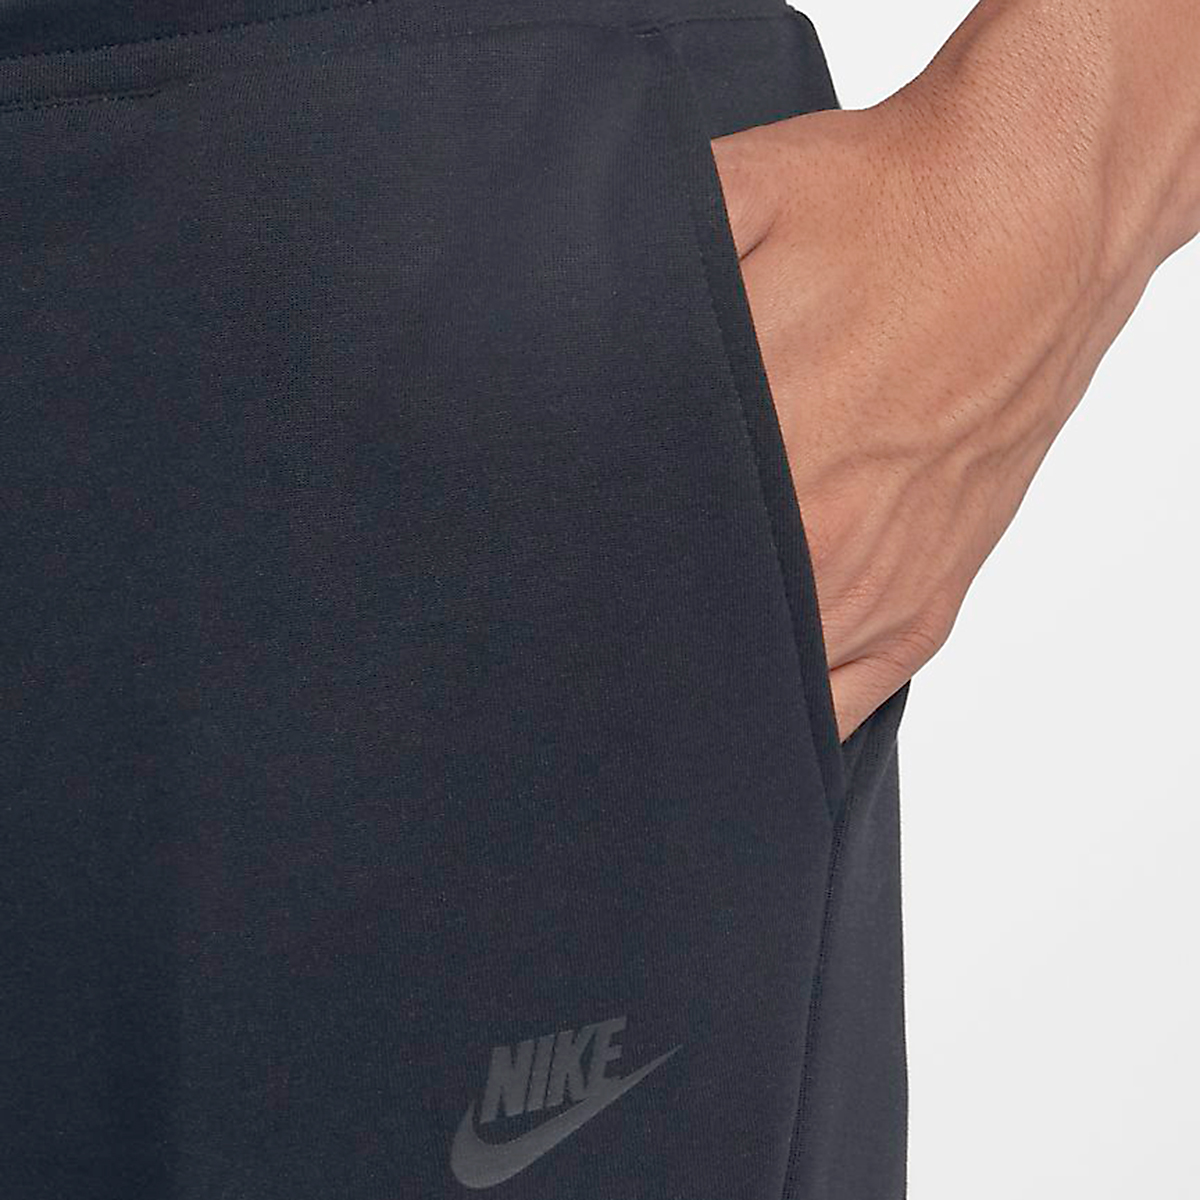 Men's Nike Tech Fleece Jogger - Color: Black - Size: L, Black, large, image 4